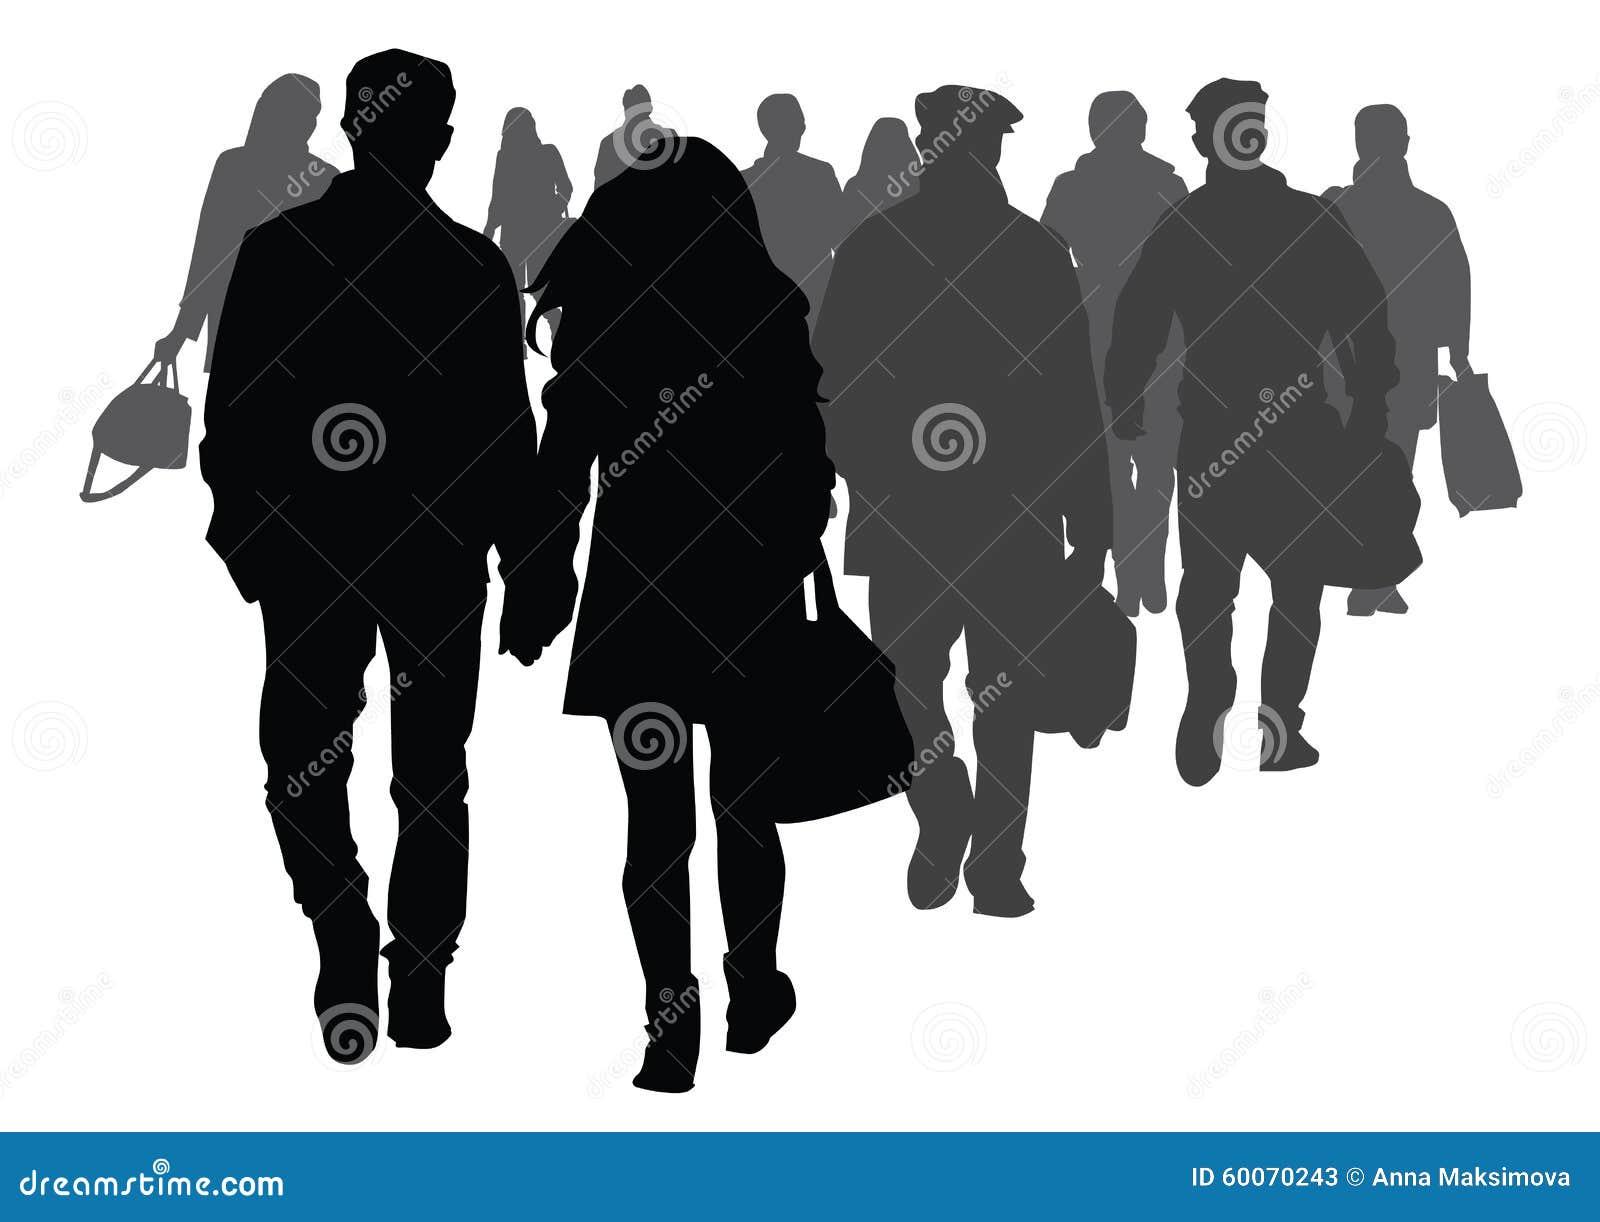 Silhouette Of People Walking On Street